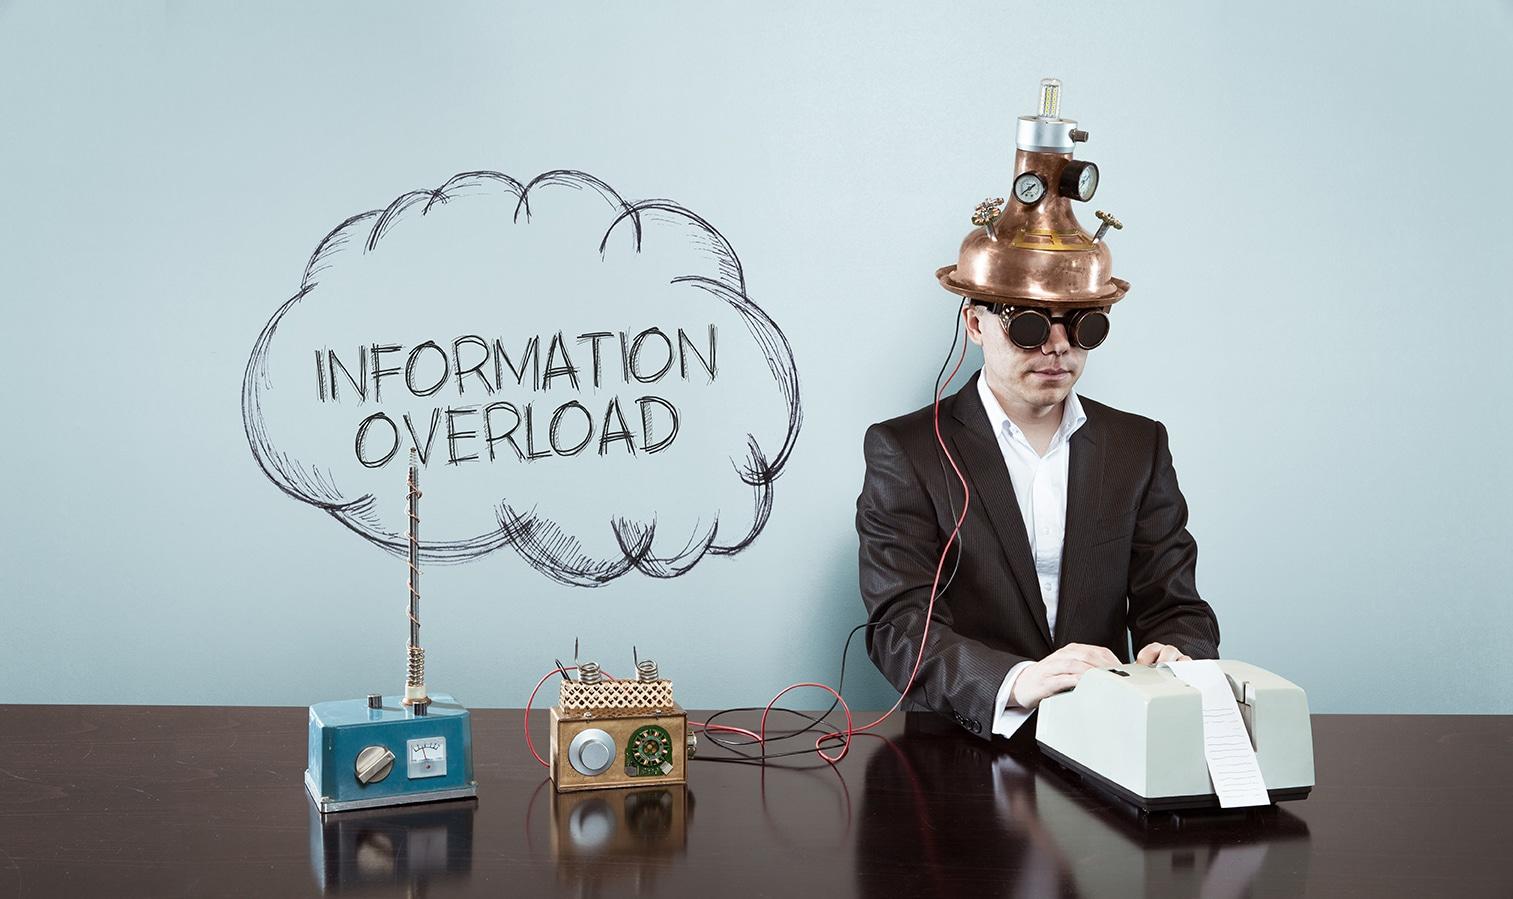 Cisco ASR 1001-X Overloading QFP